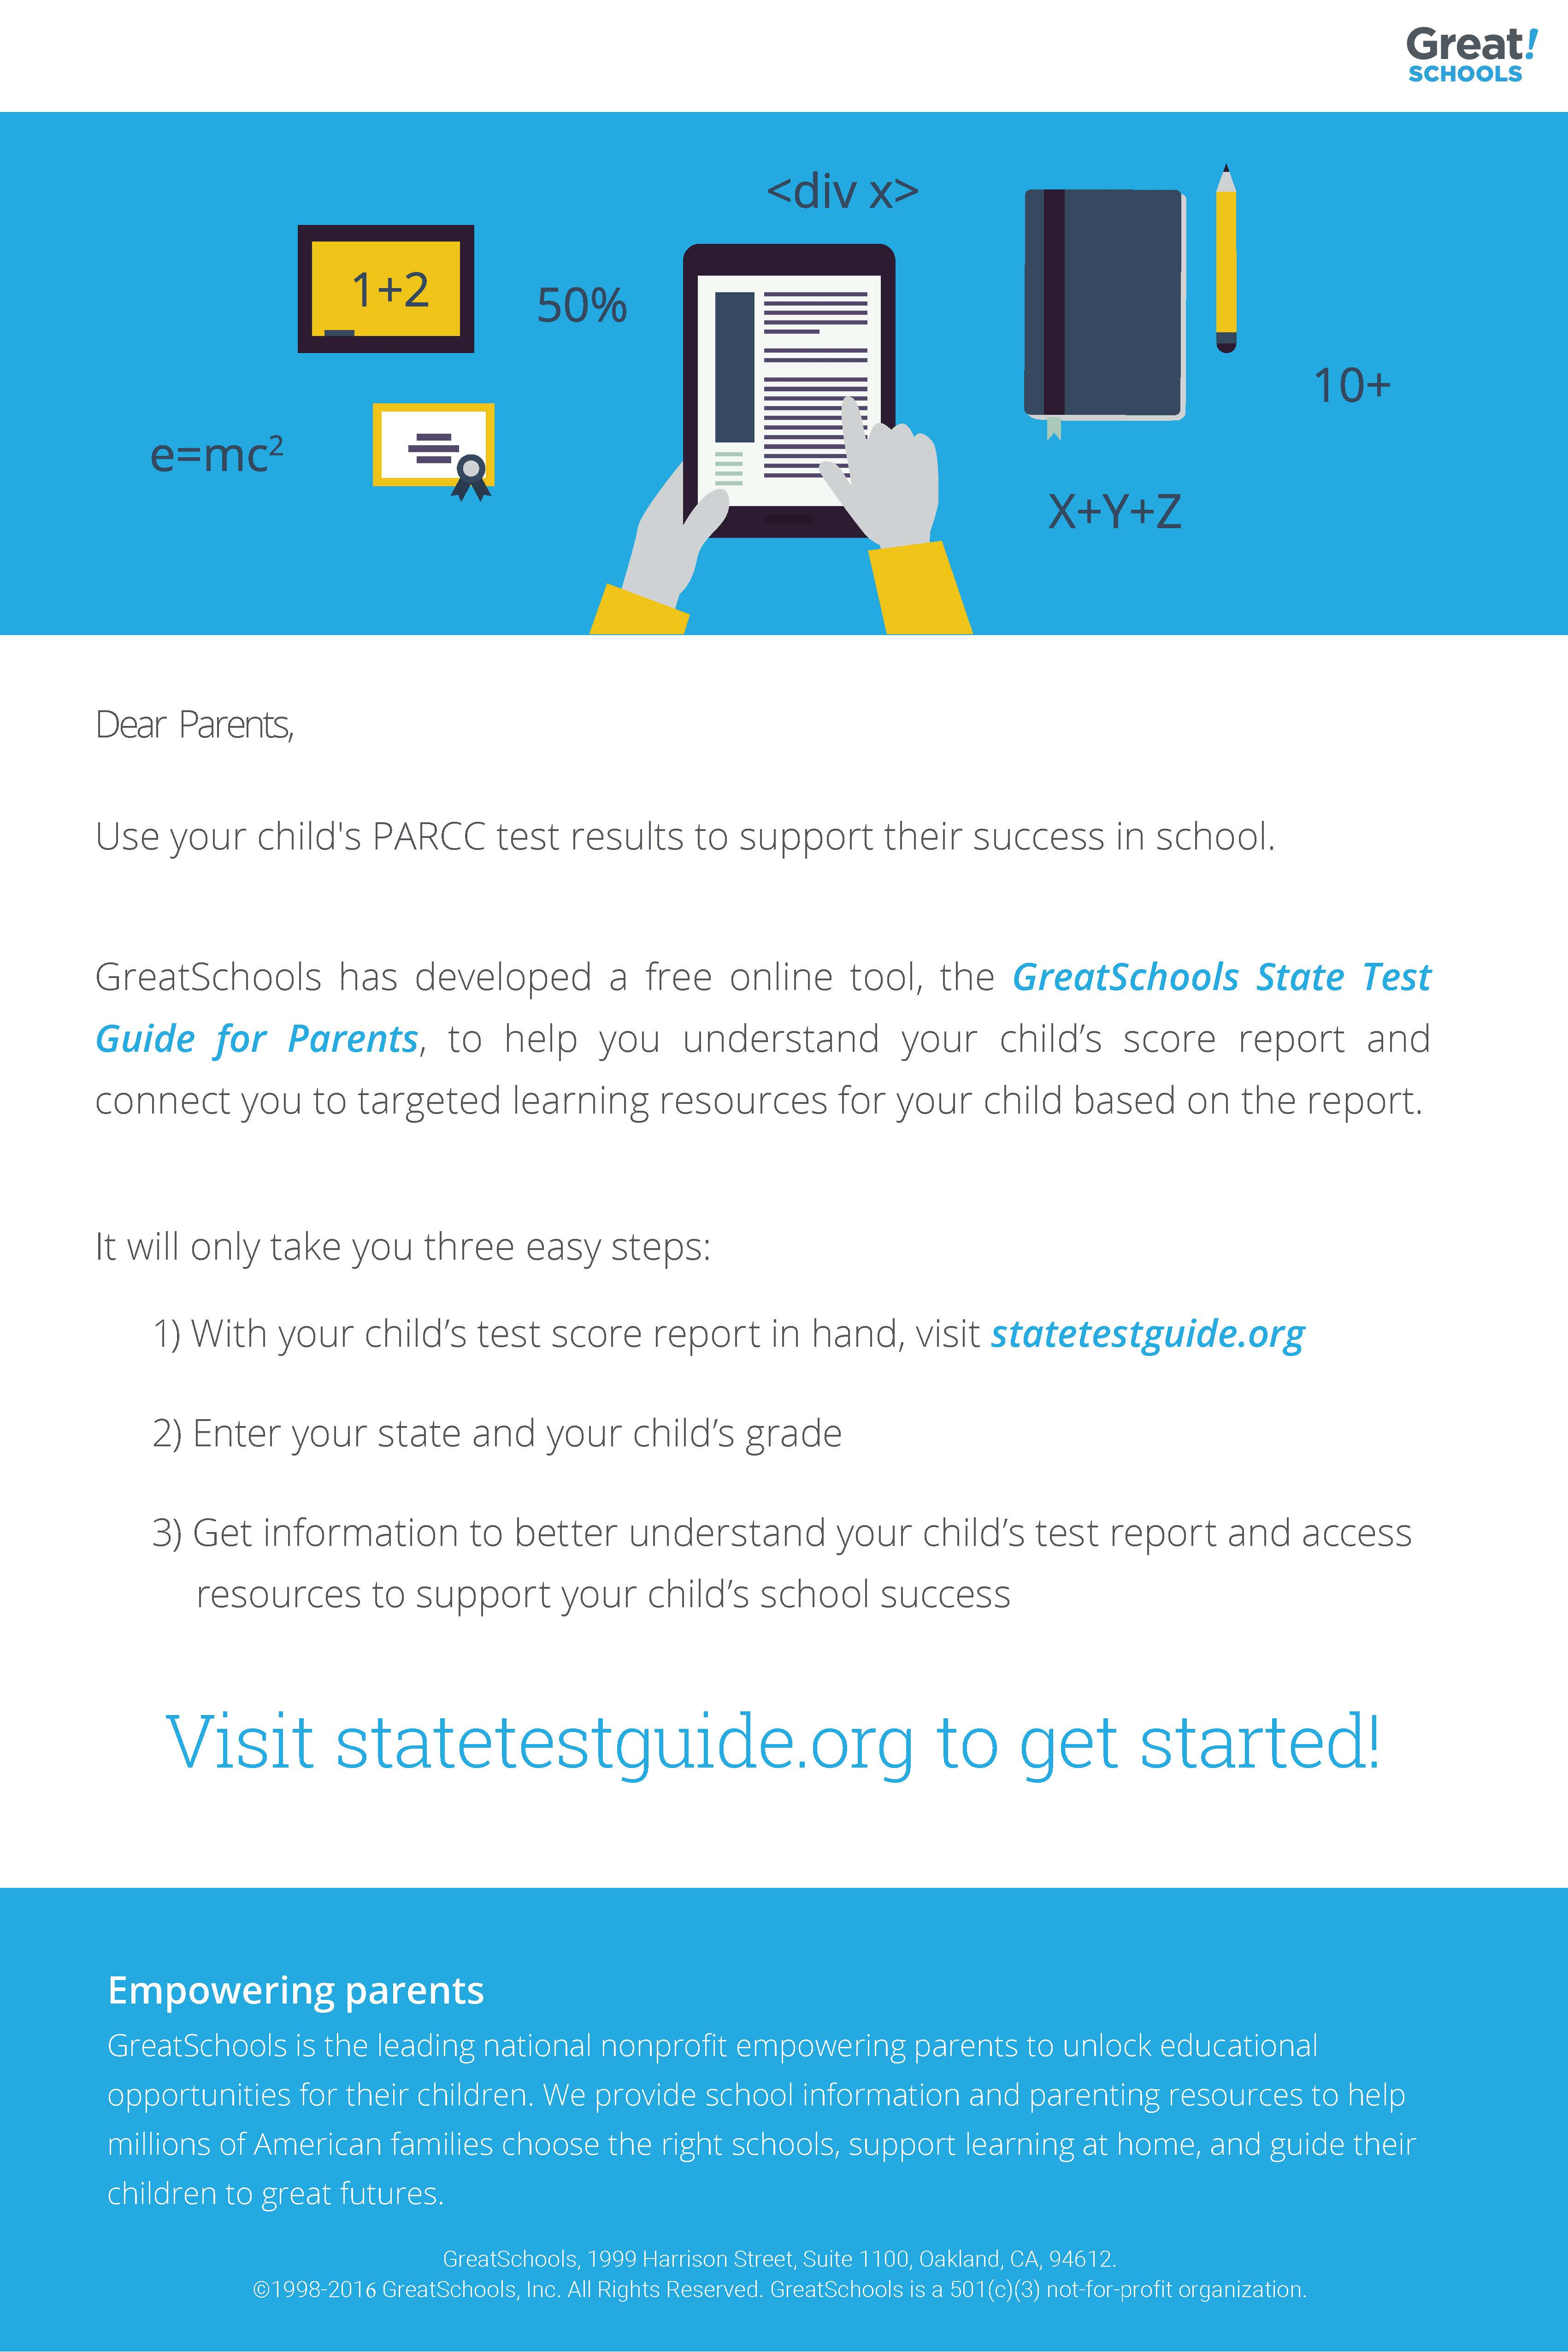 Worksheet Grade Schools.org greatschools state test guide for parents partner toolkit parent email parcc